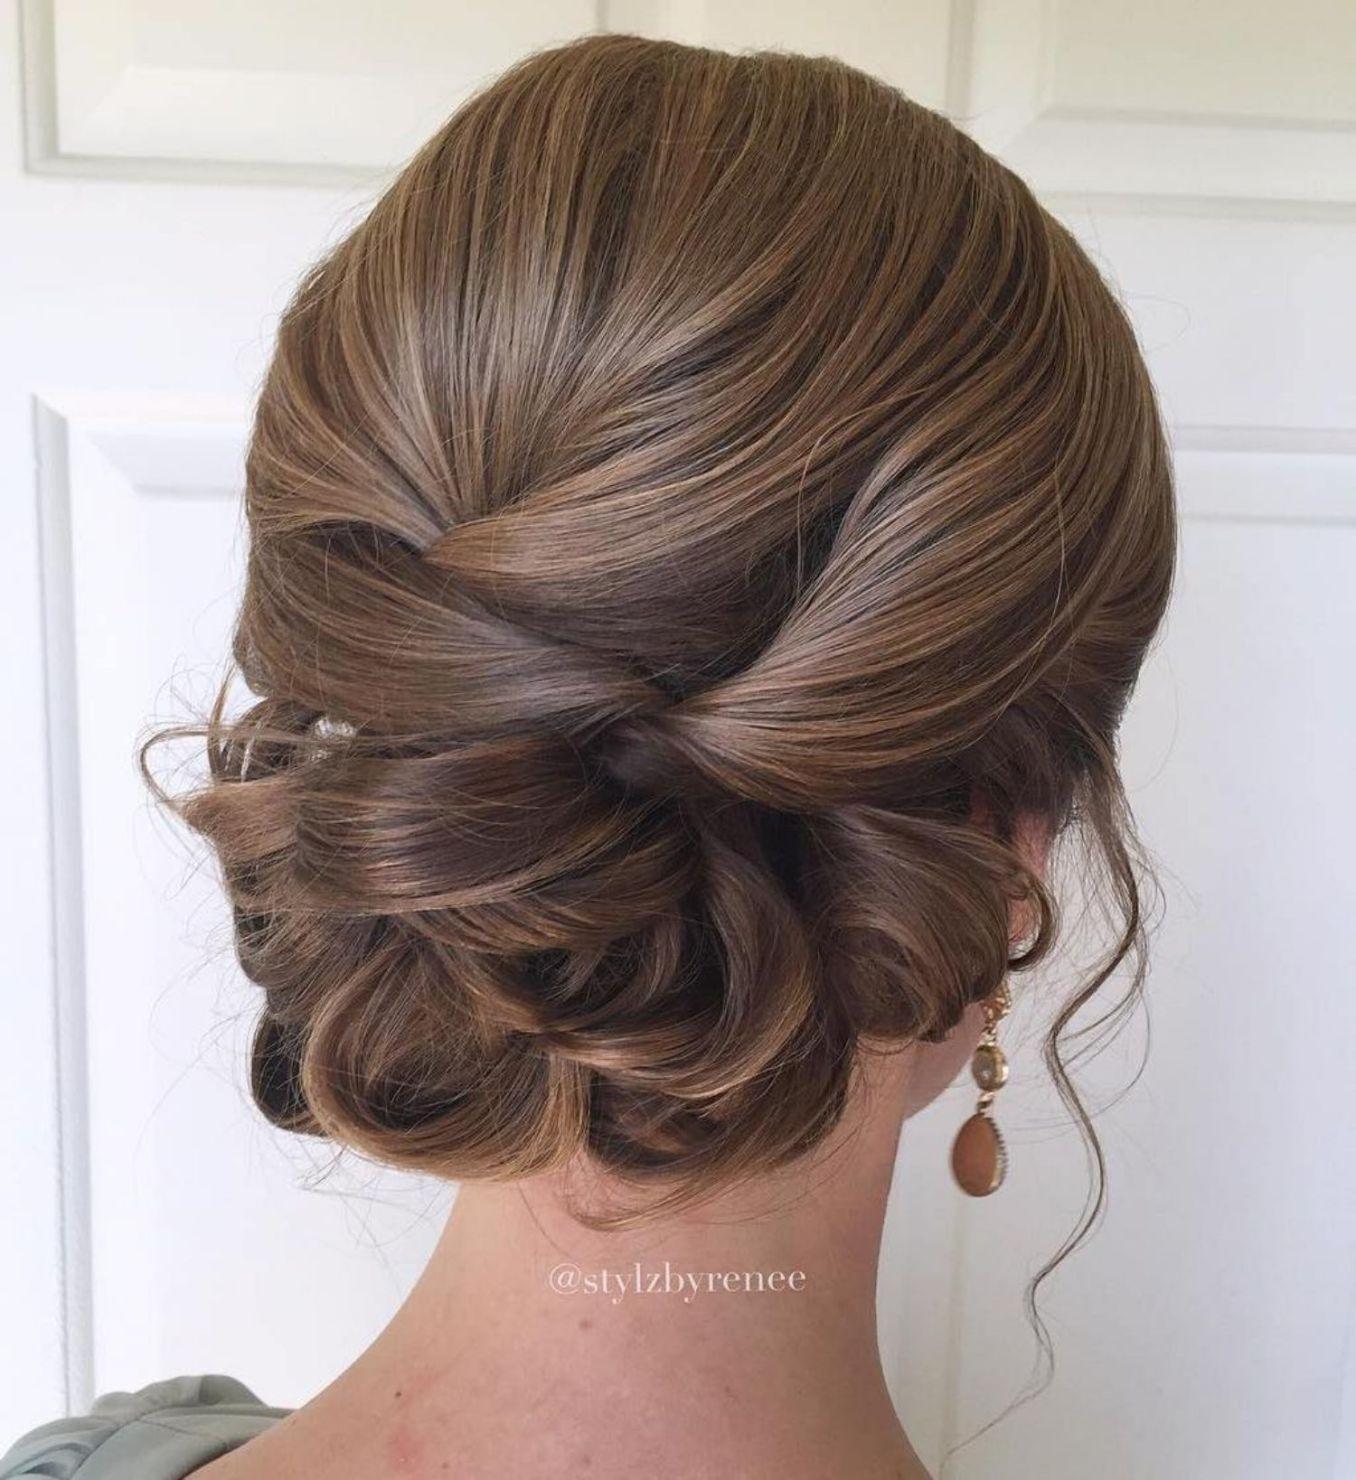 Hair Updos For Medium Length Hair